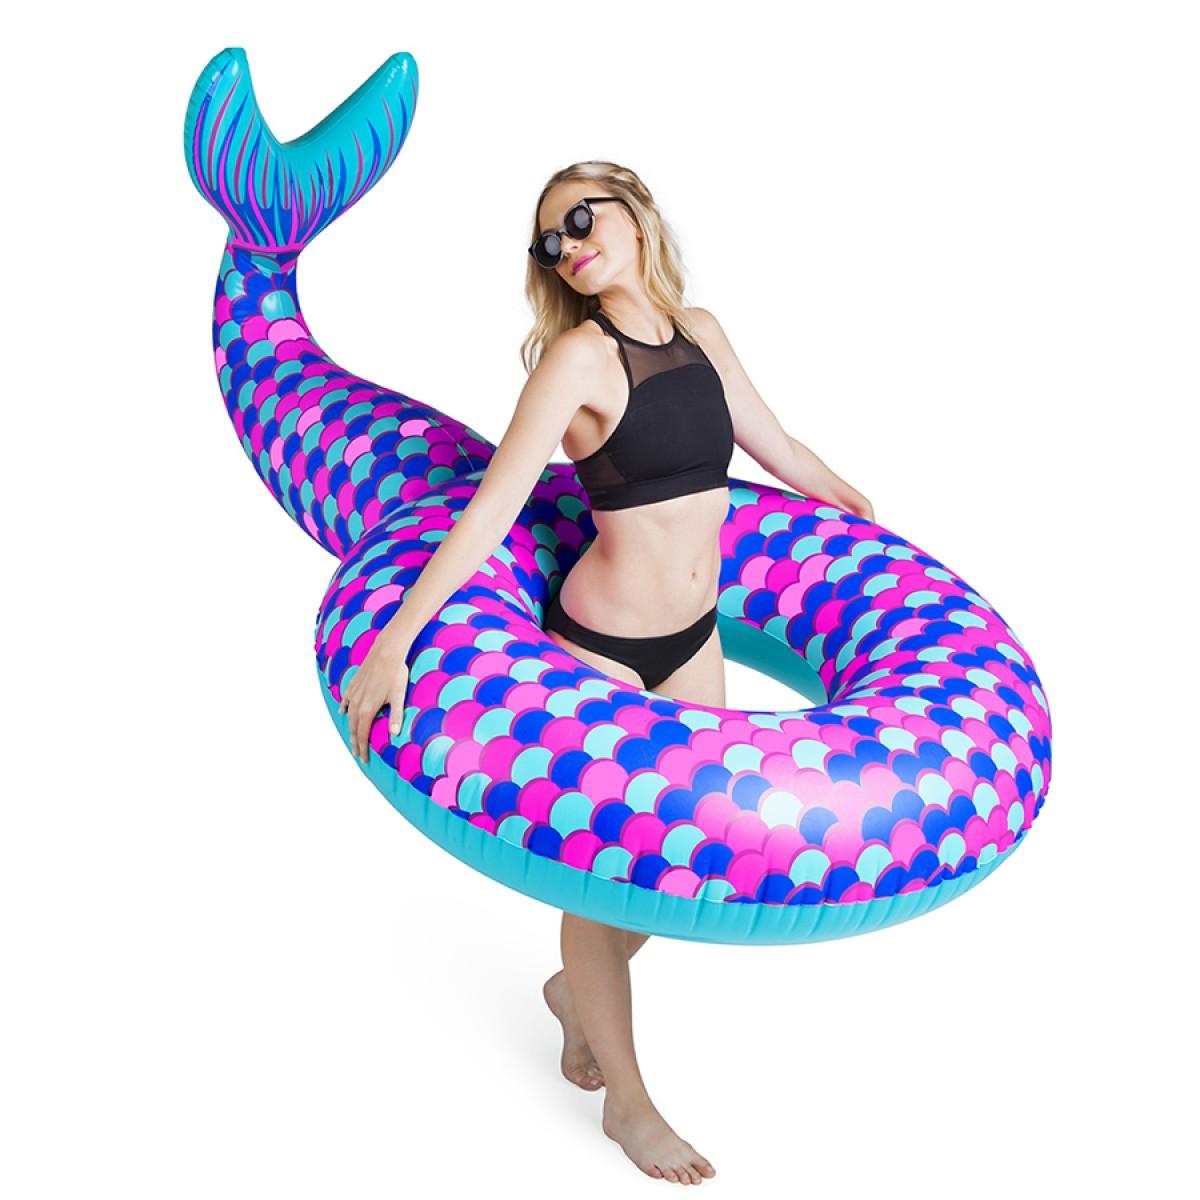 Надувной круг Хвост Русалки (Mermaid Tail)